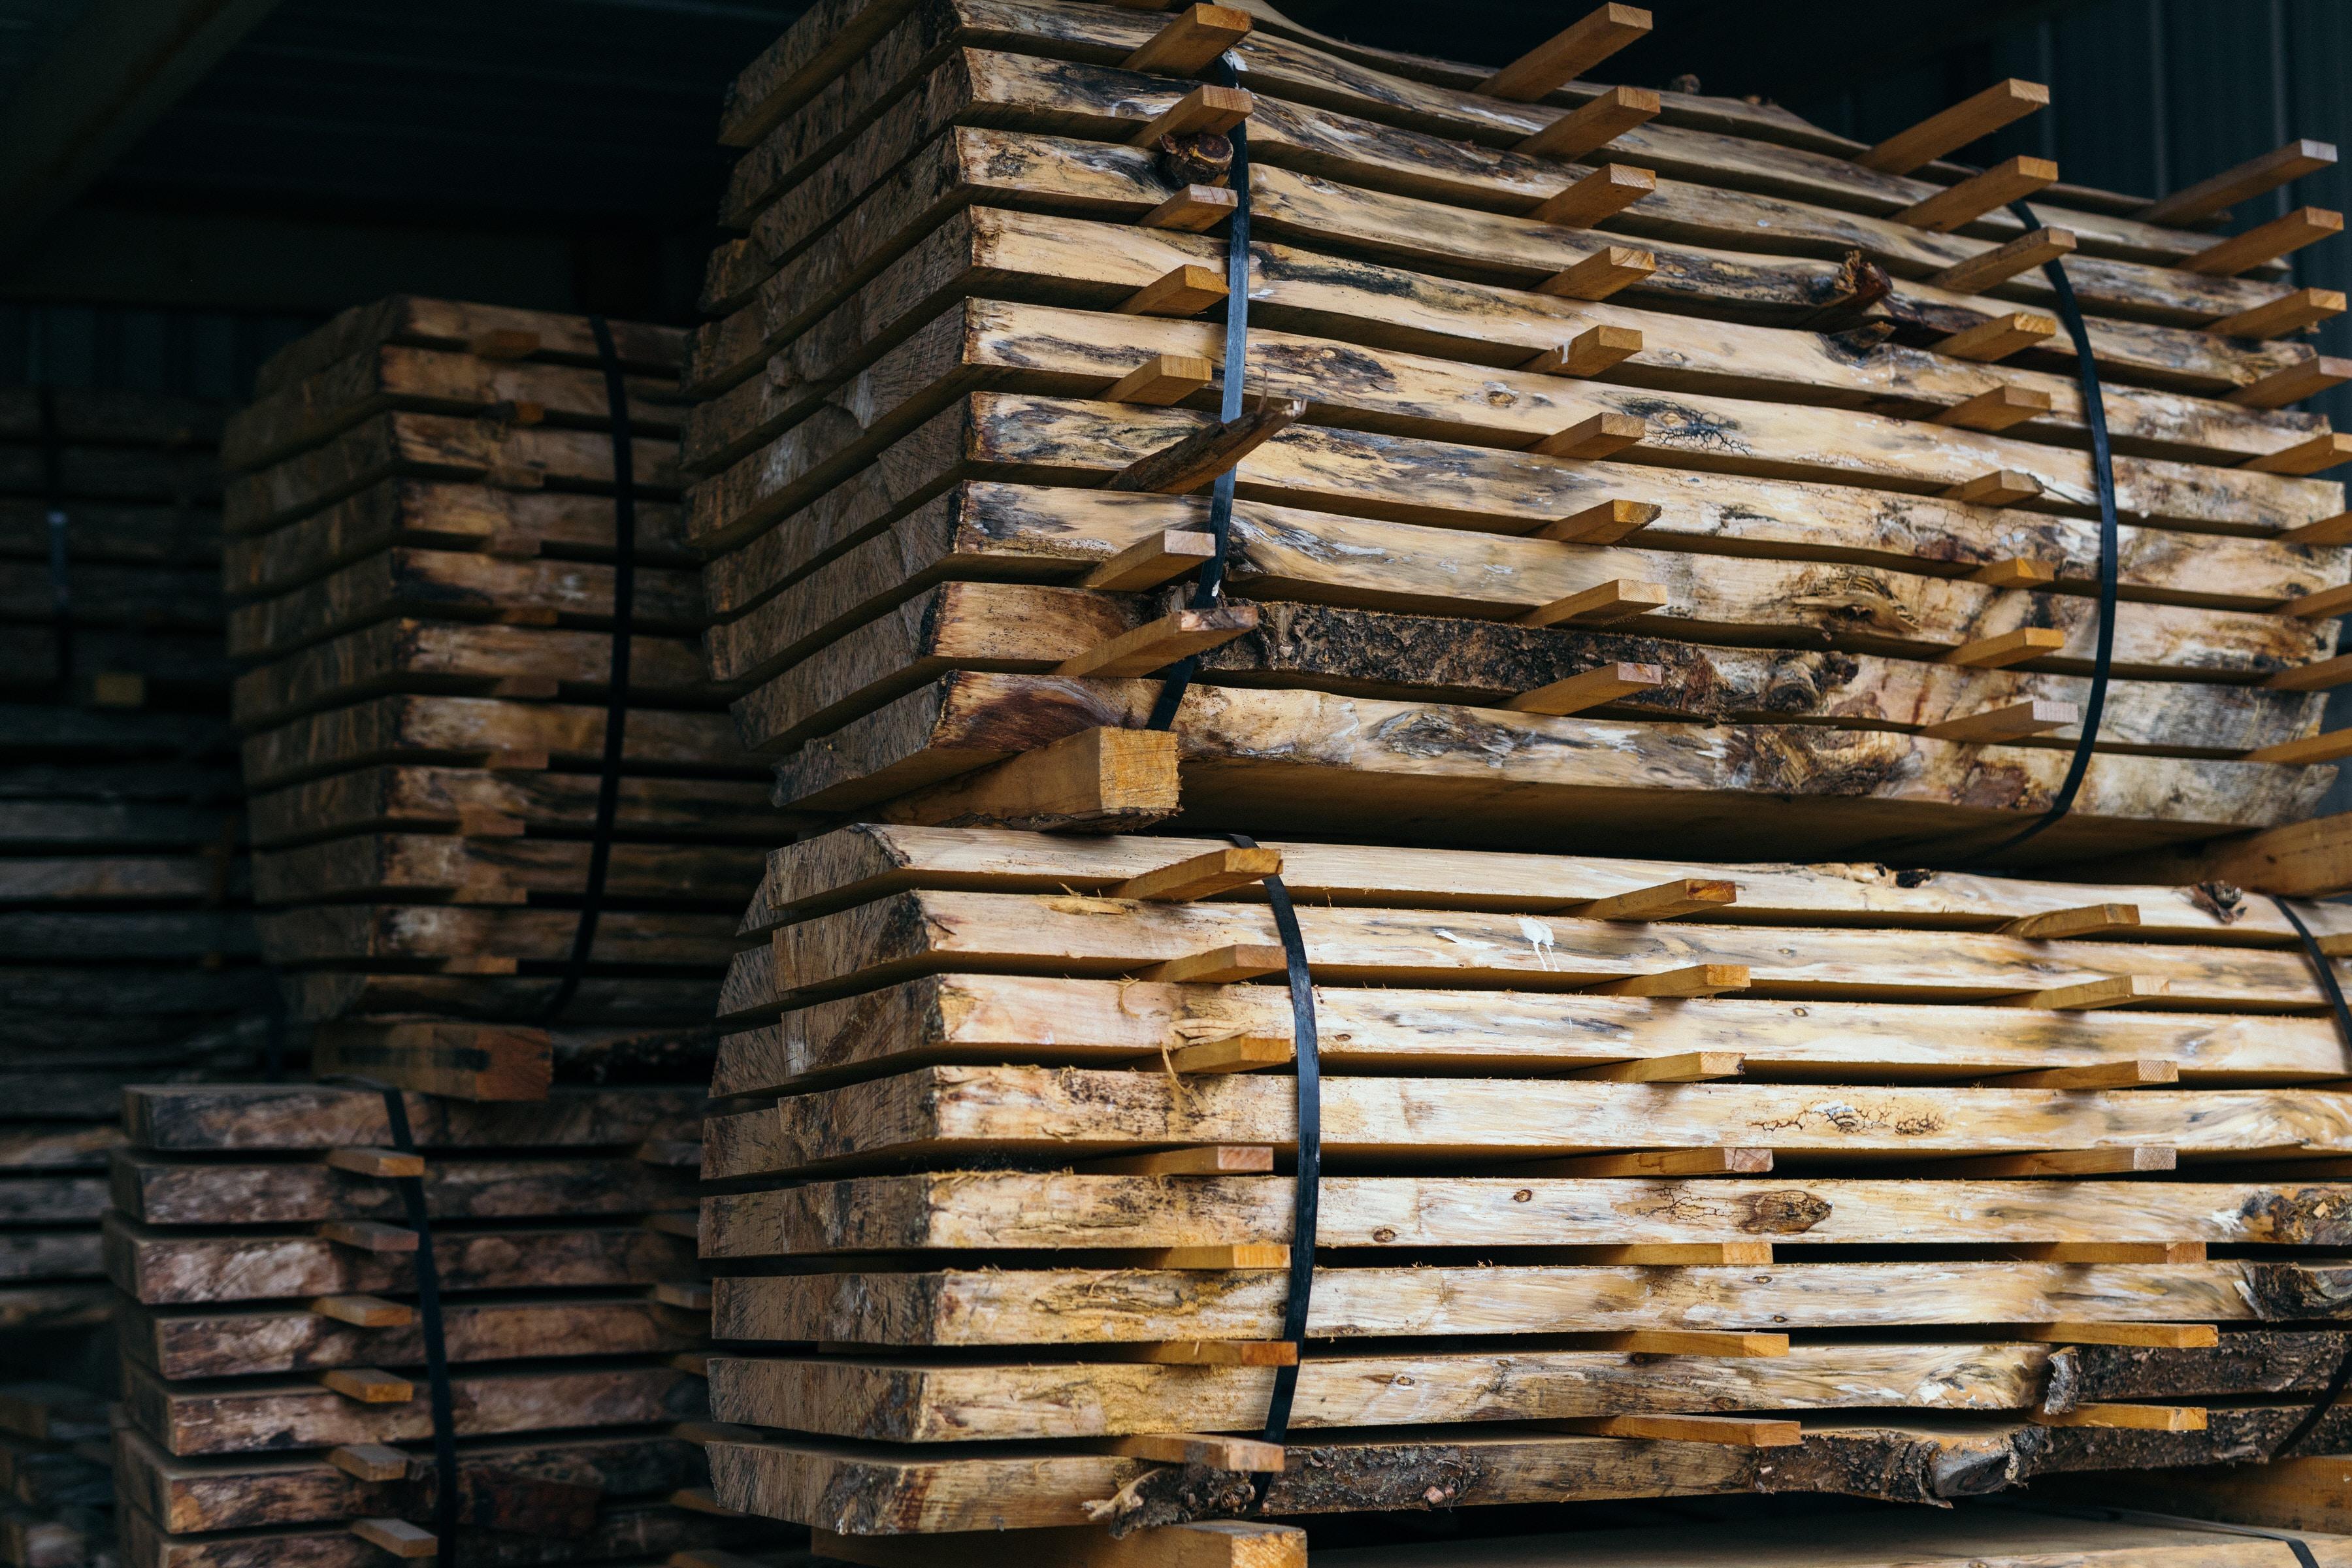 closeup photo of beige wooden stands